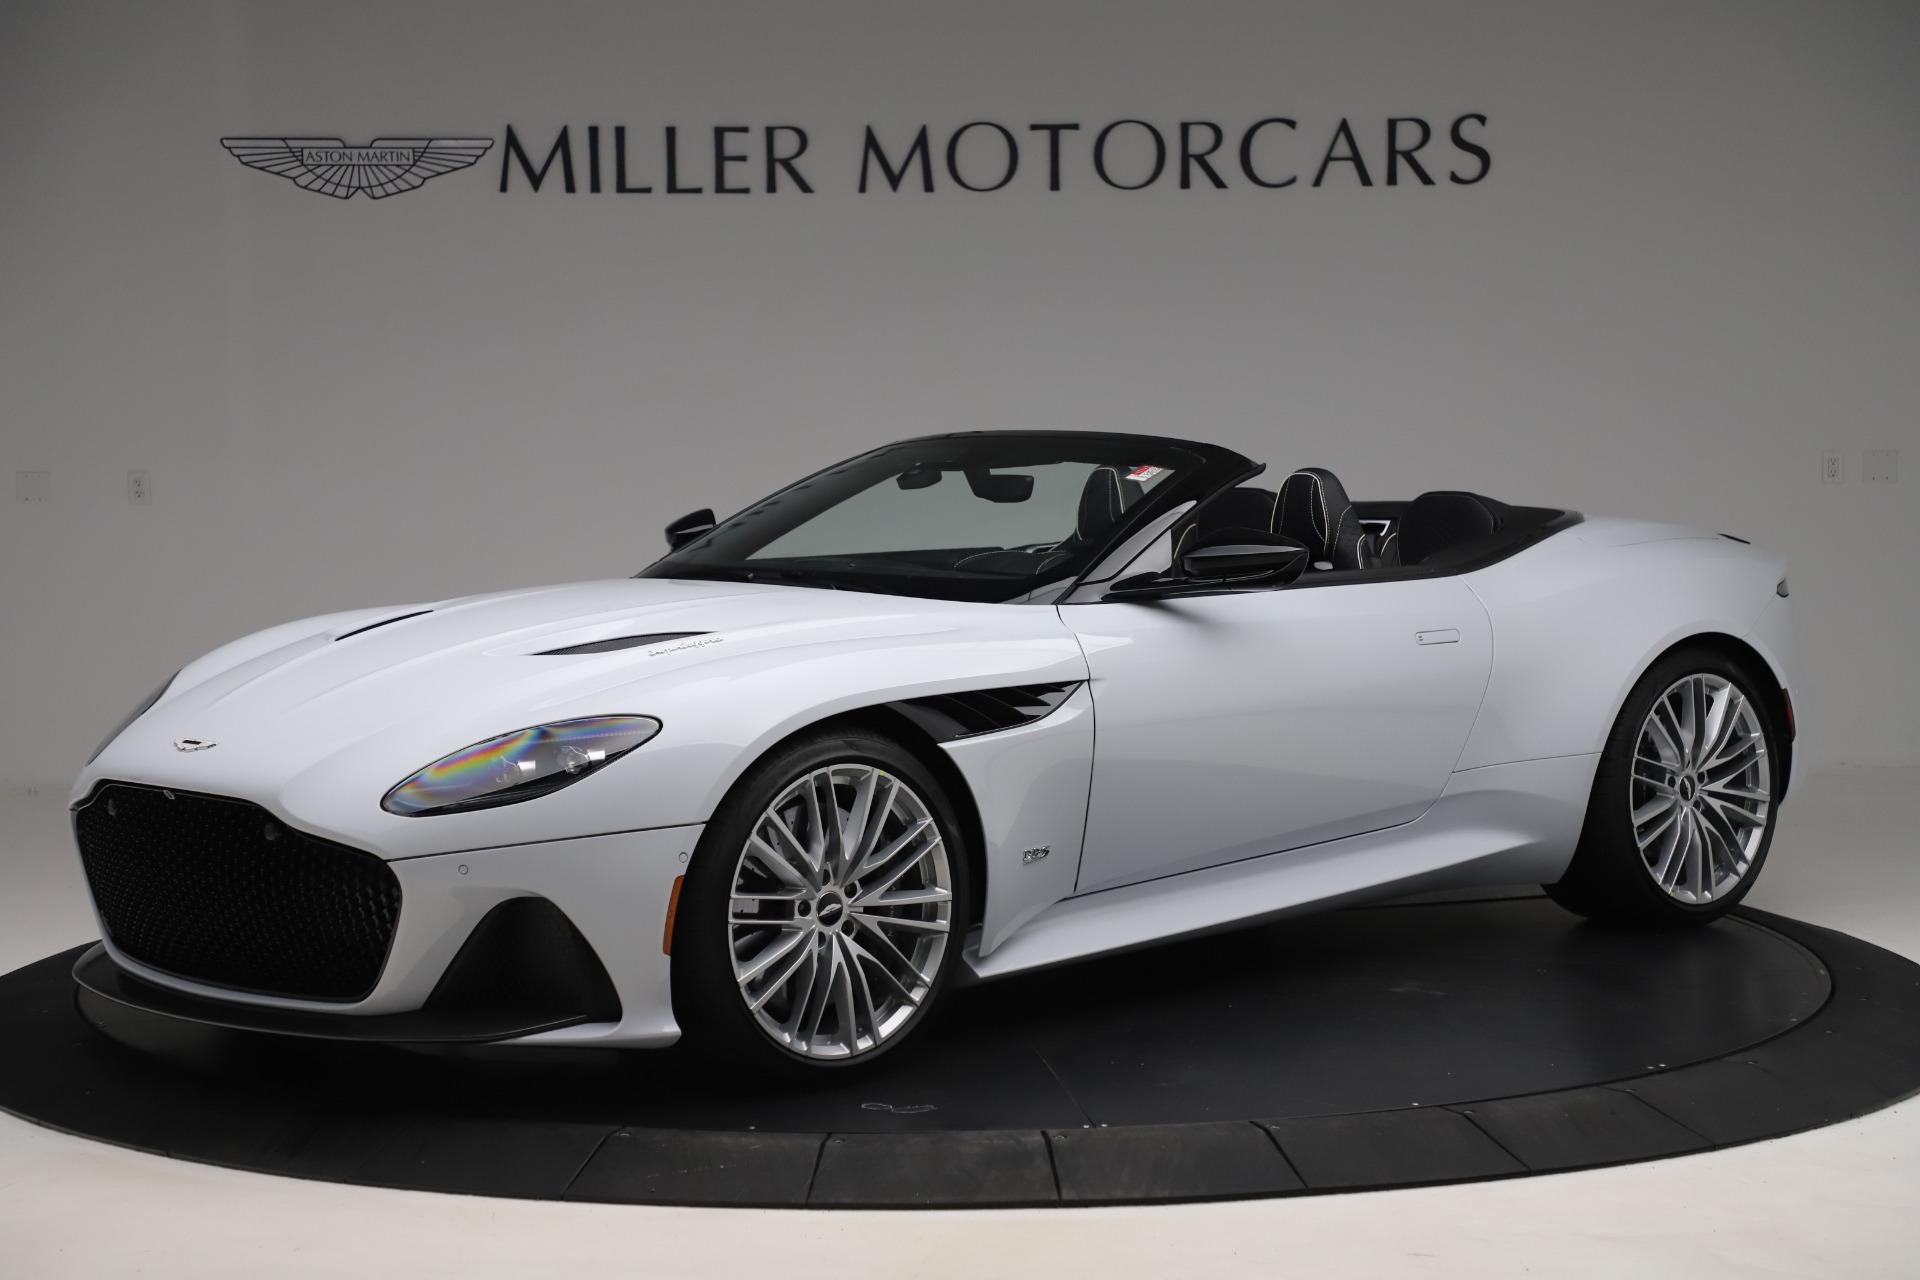 New 2020 Aston Martin Dbs Superleggera Volante For Sale Special Pricing Aston Martin Of Greenwich Stock A1482